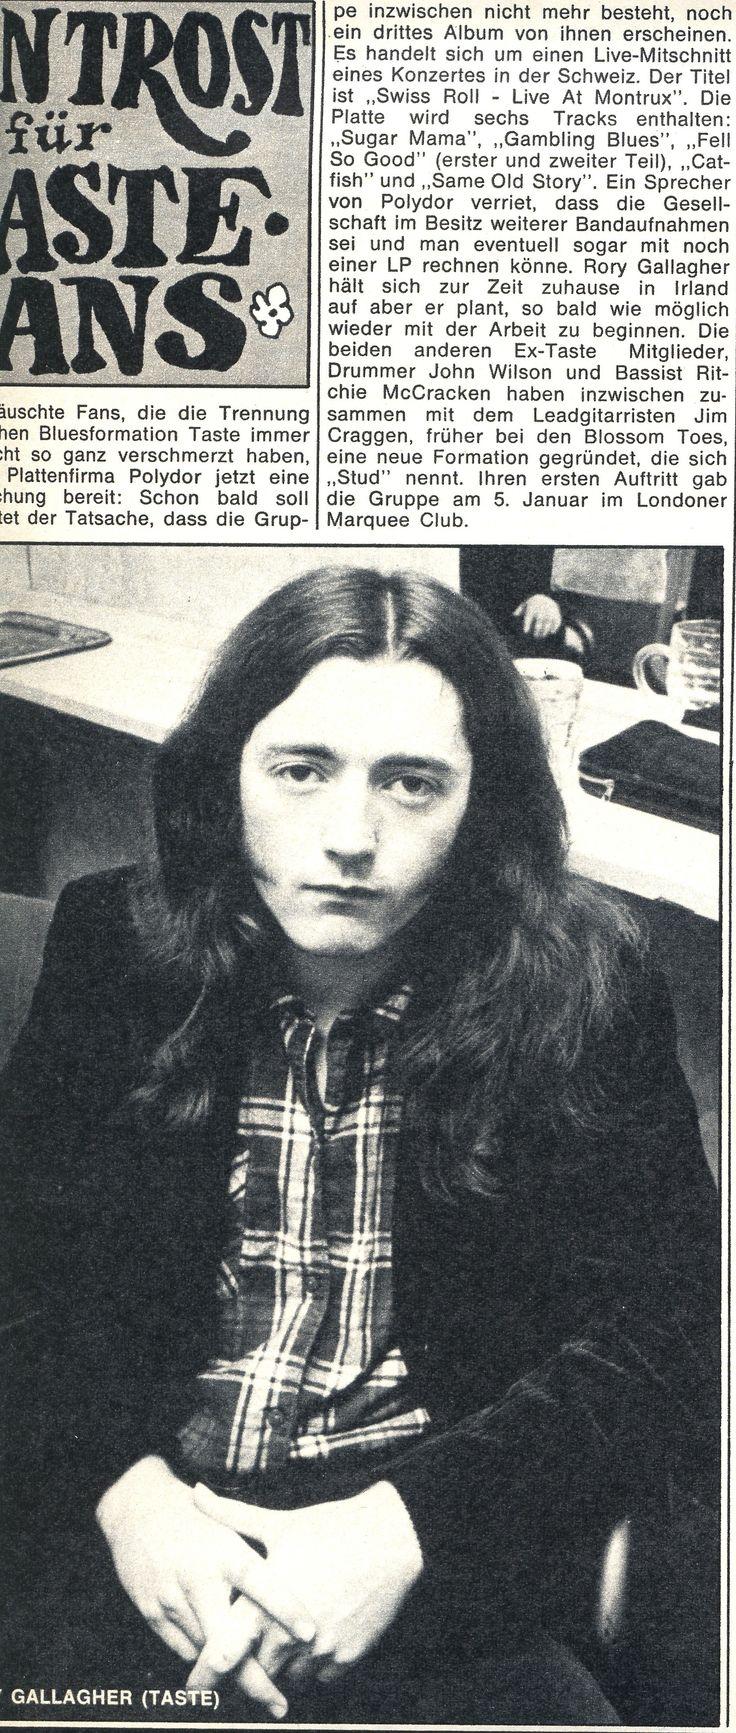 Taste Mk 2 (1968-1970) - Page 19 27cd5bf53b80bb6e3ad01174a3a79fb4